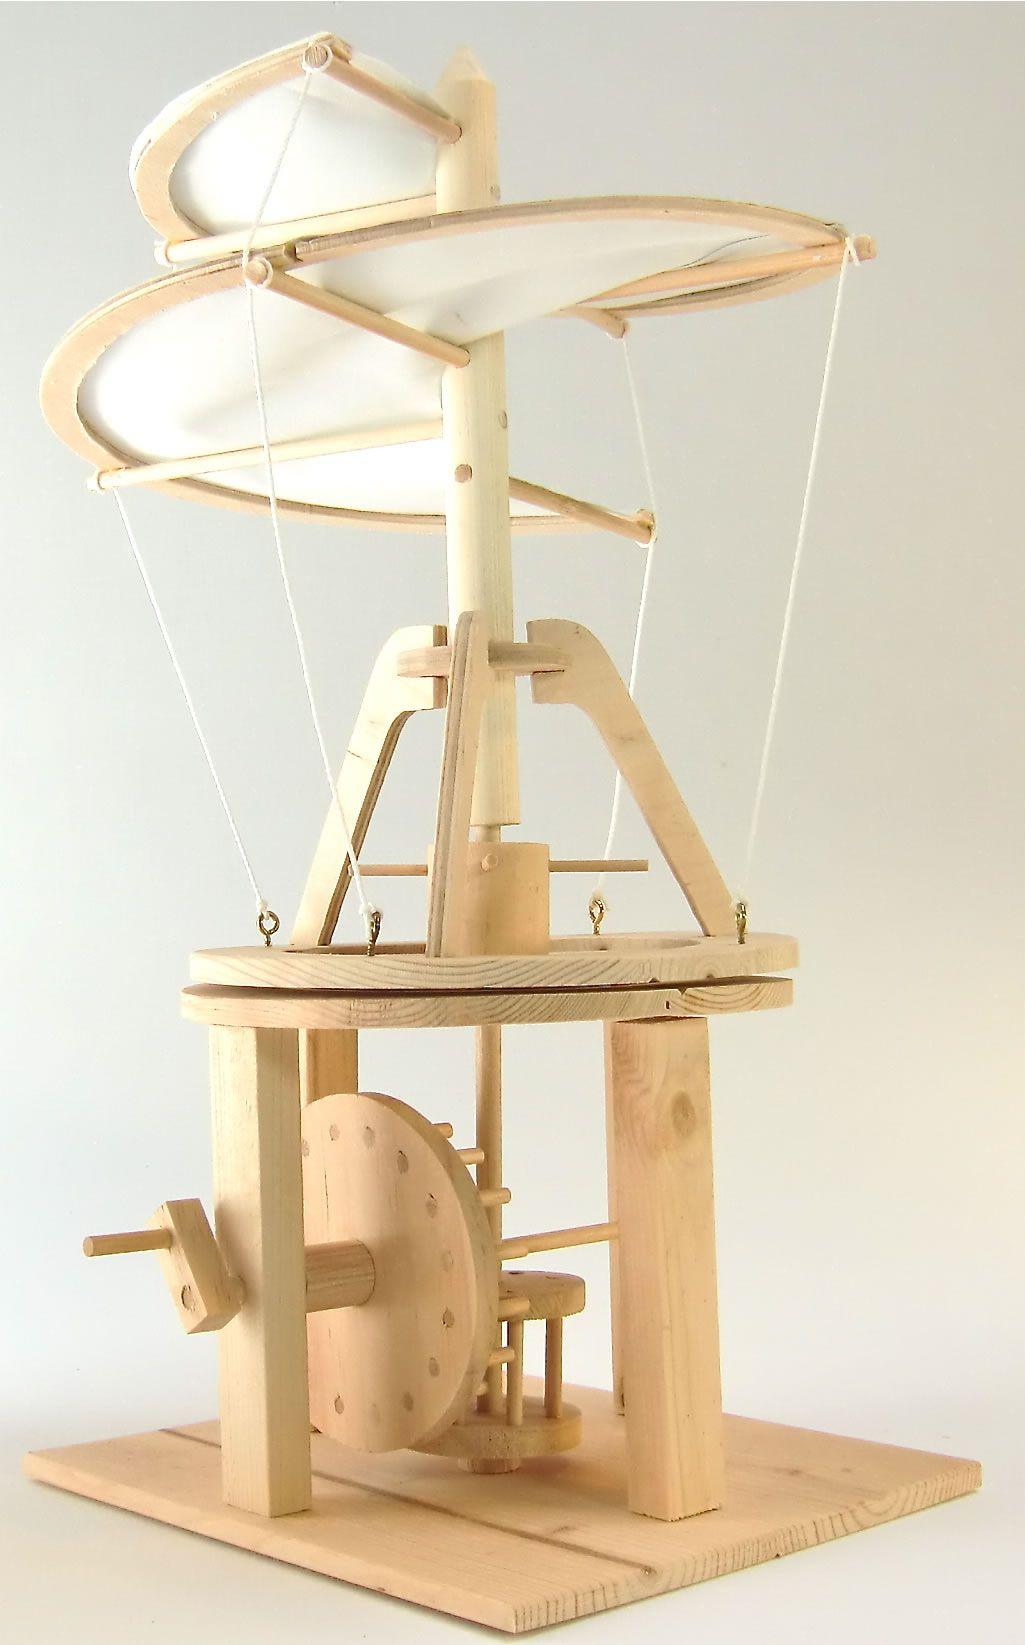 Pathfinders Design And Technology Da Vinci Inventions Leonardo Da Vinci Kinetic Toys